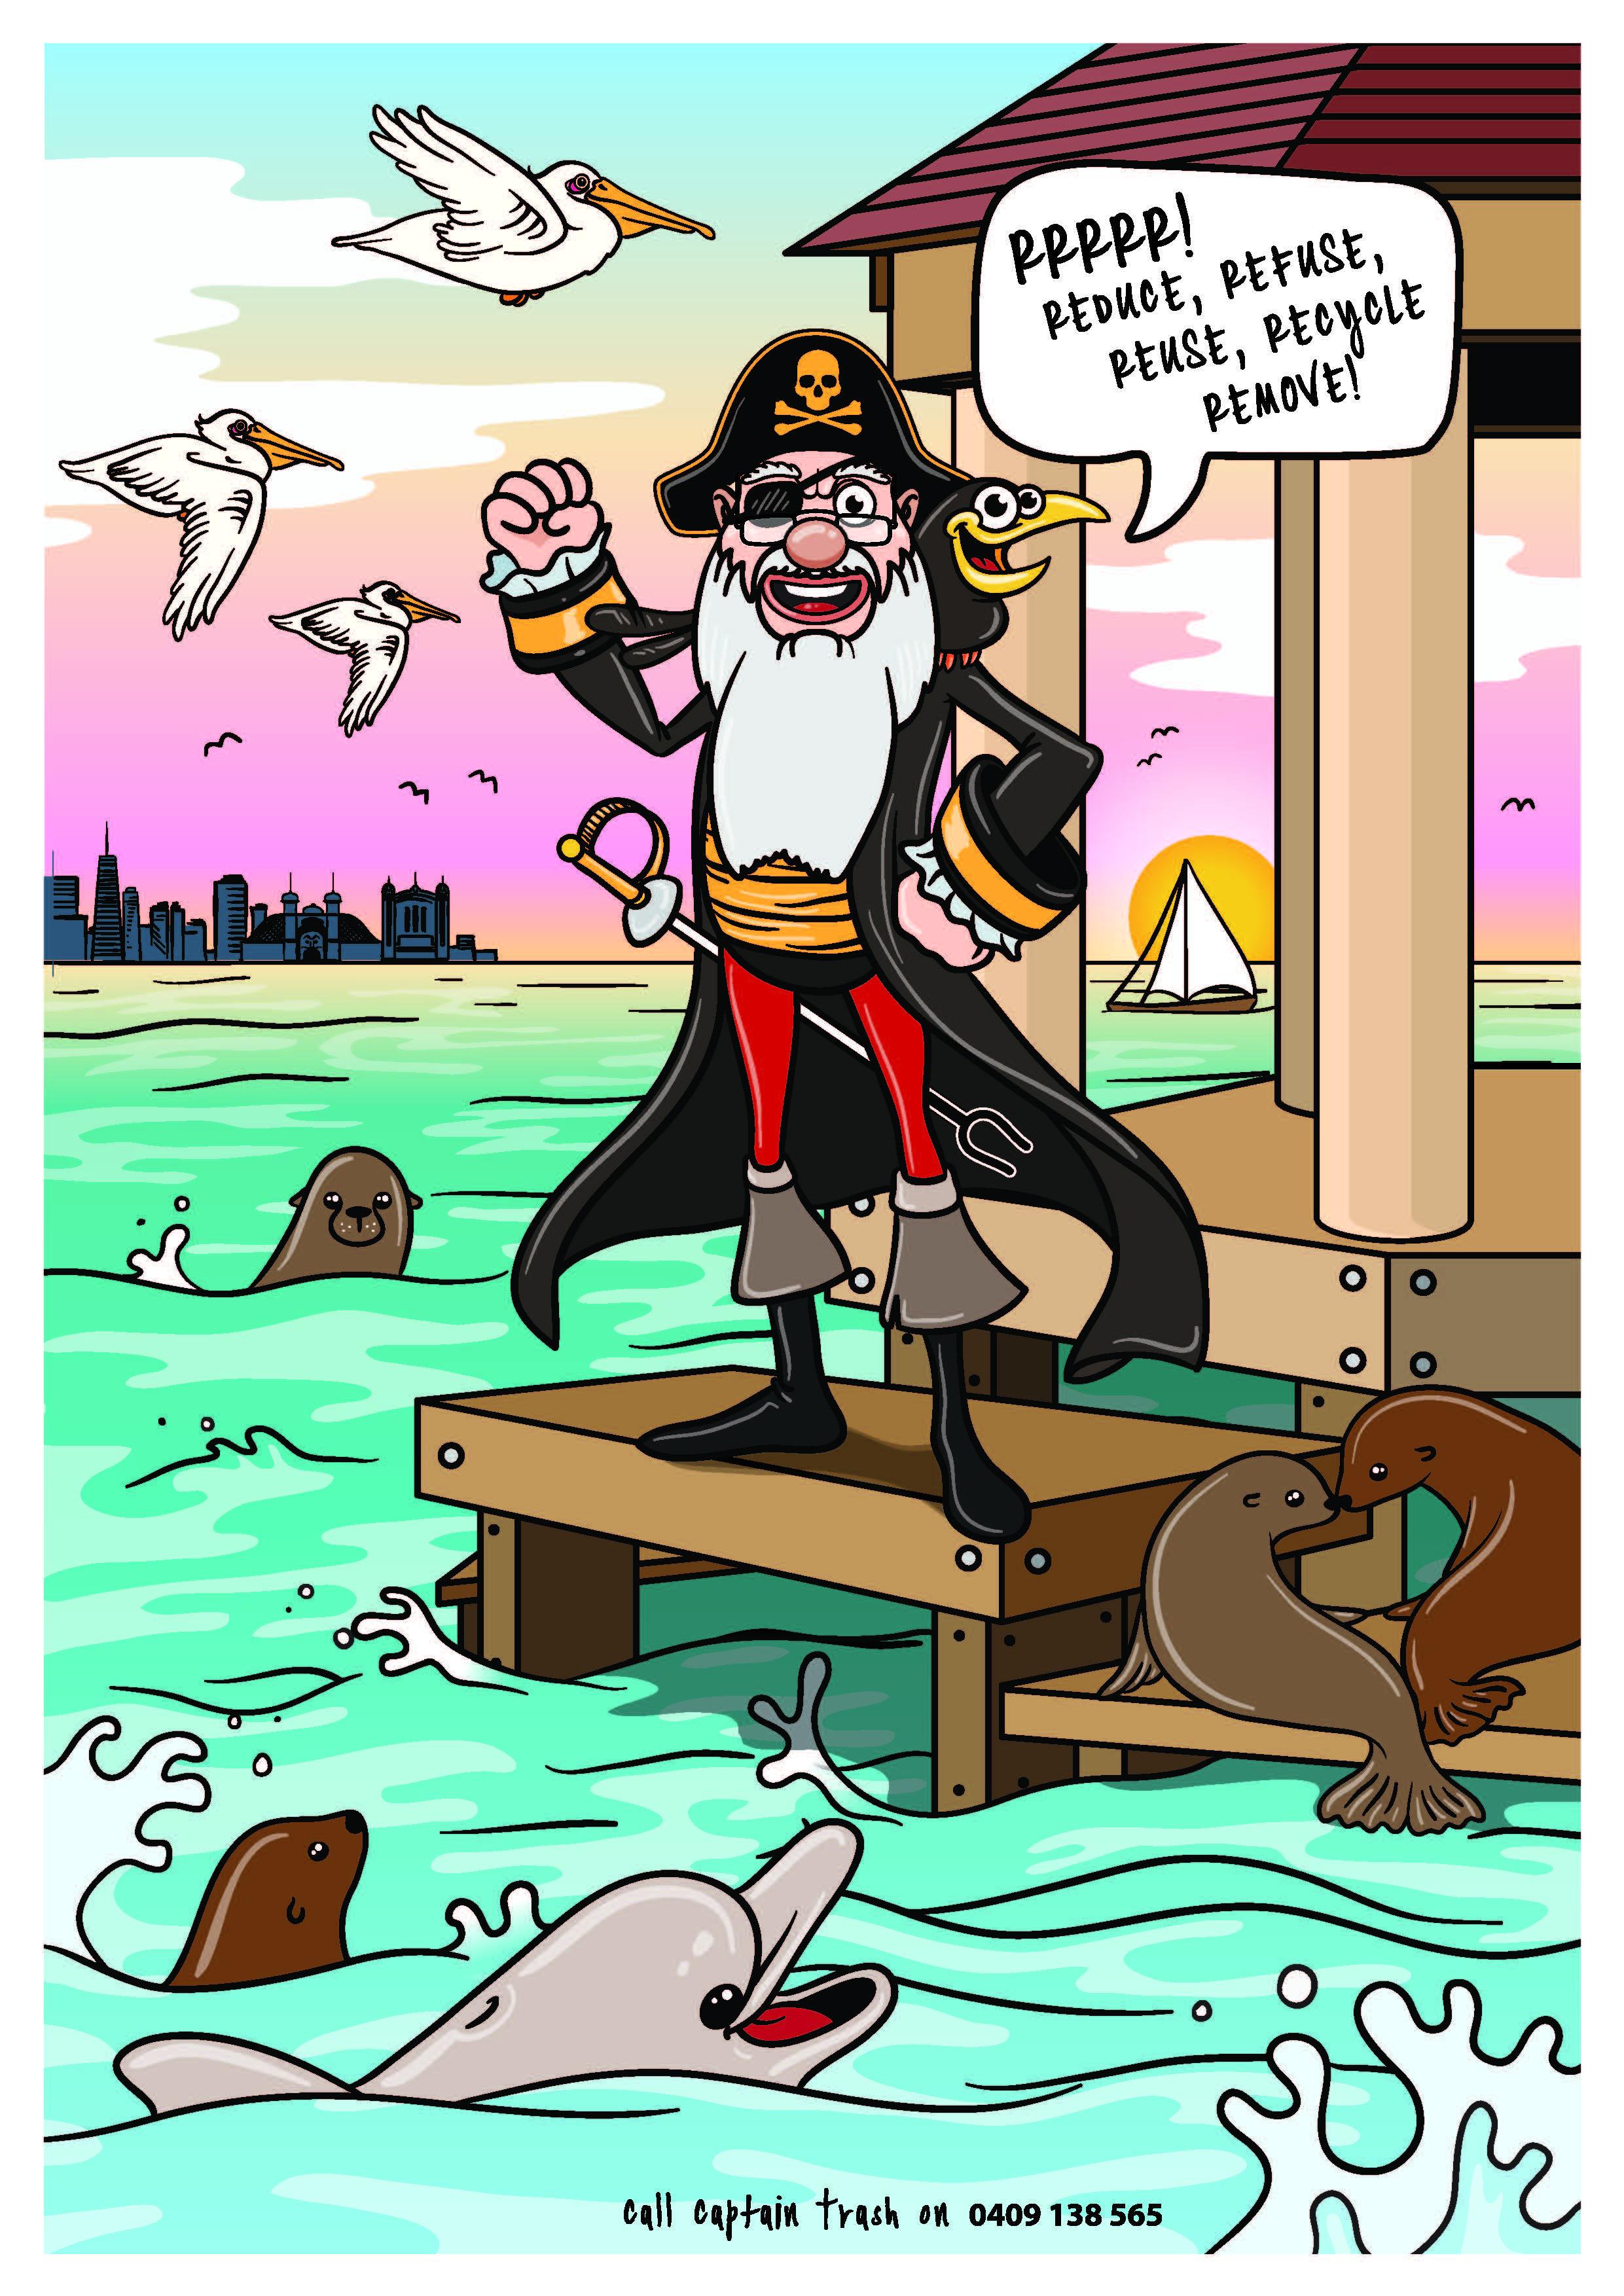 Captain Trash - The Bay Keeper